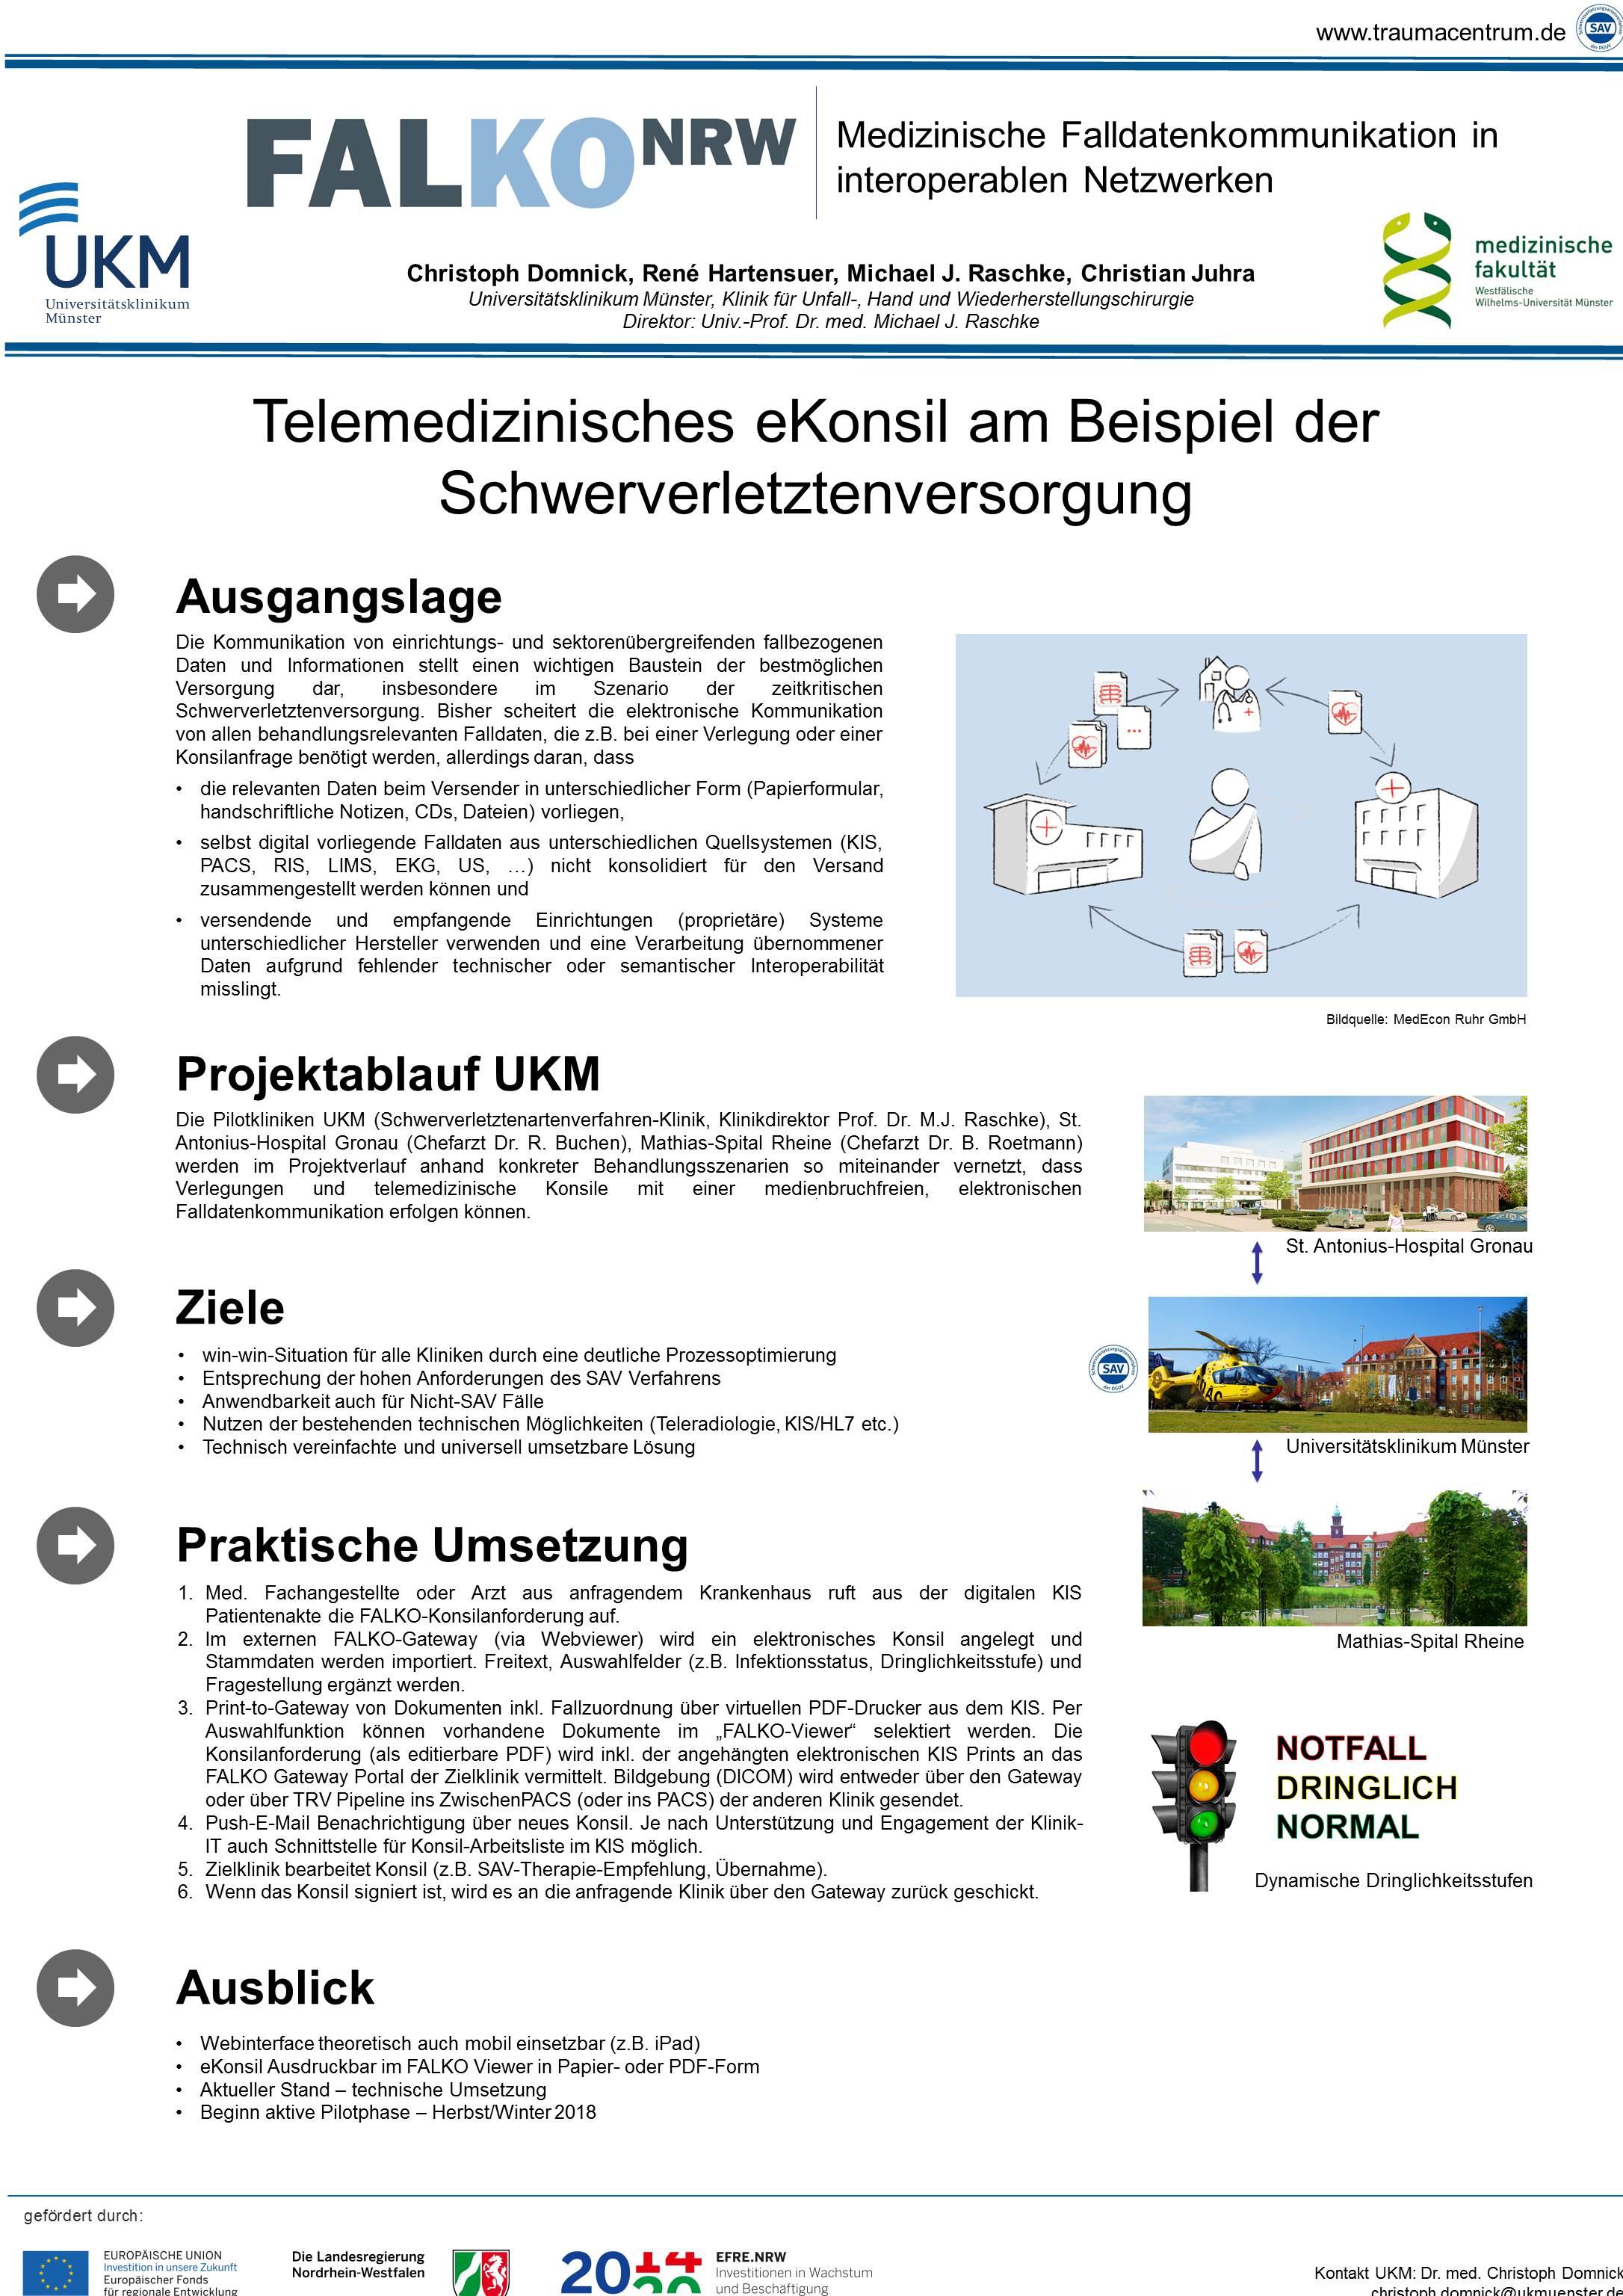 Das Projekt   Falko NRW